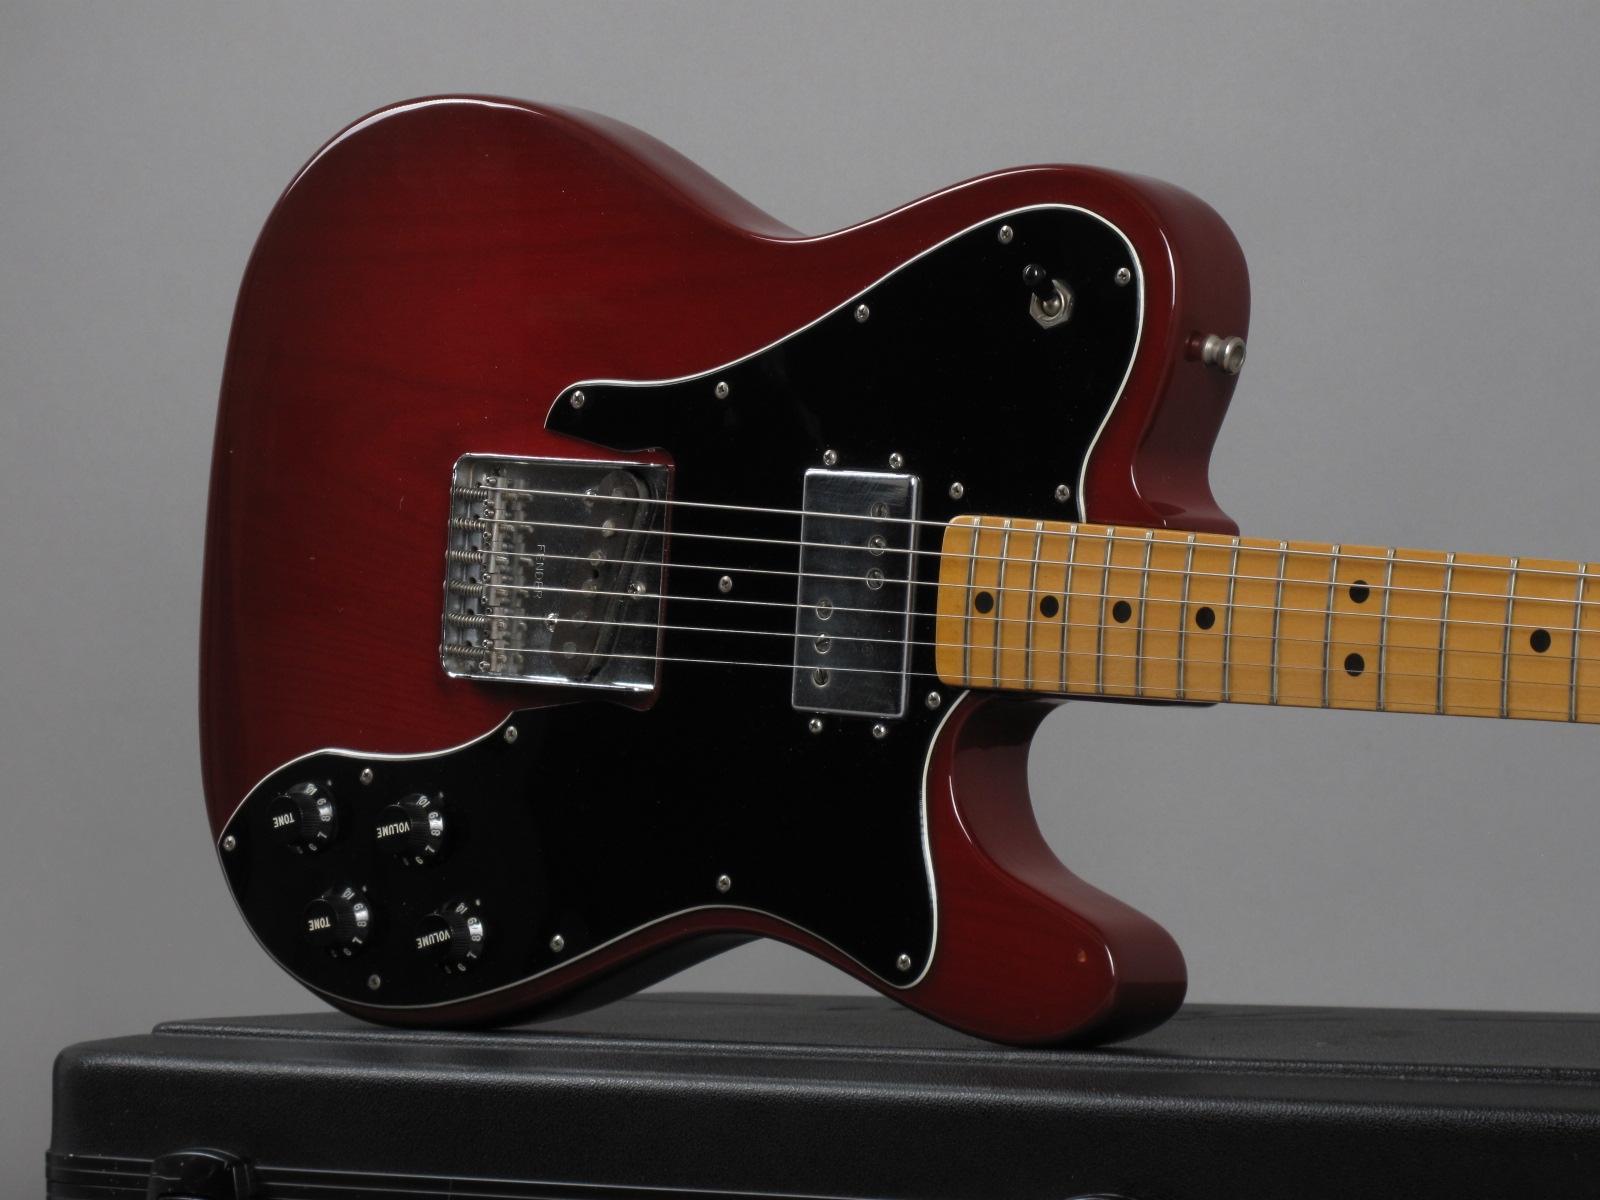 https://guitarpoint.de/app/uploads/products/1978-fender-telecaster-custom-transluscent-red/1978-Fender-Telecaster-Custom-Transluscent-Red-S815753_19.jpg